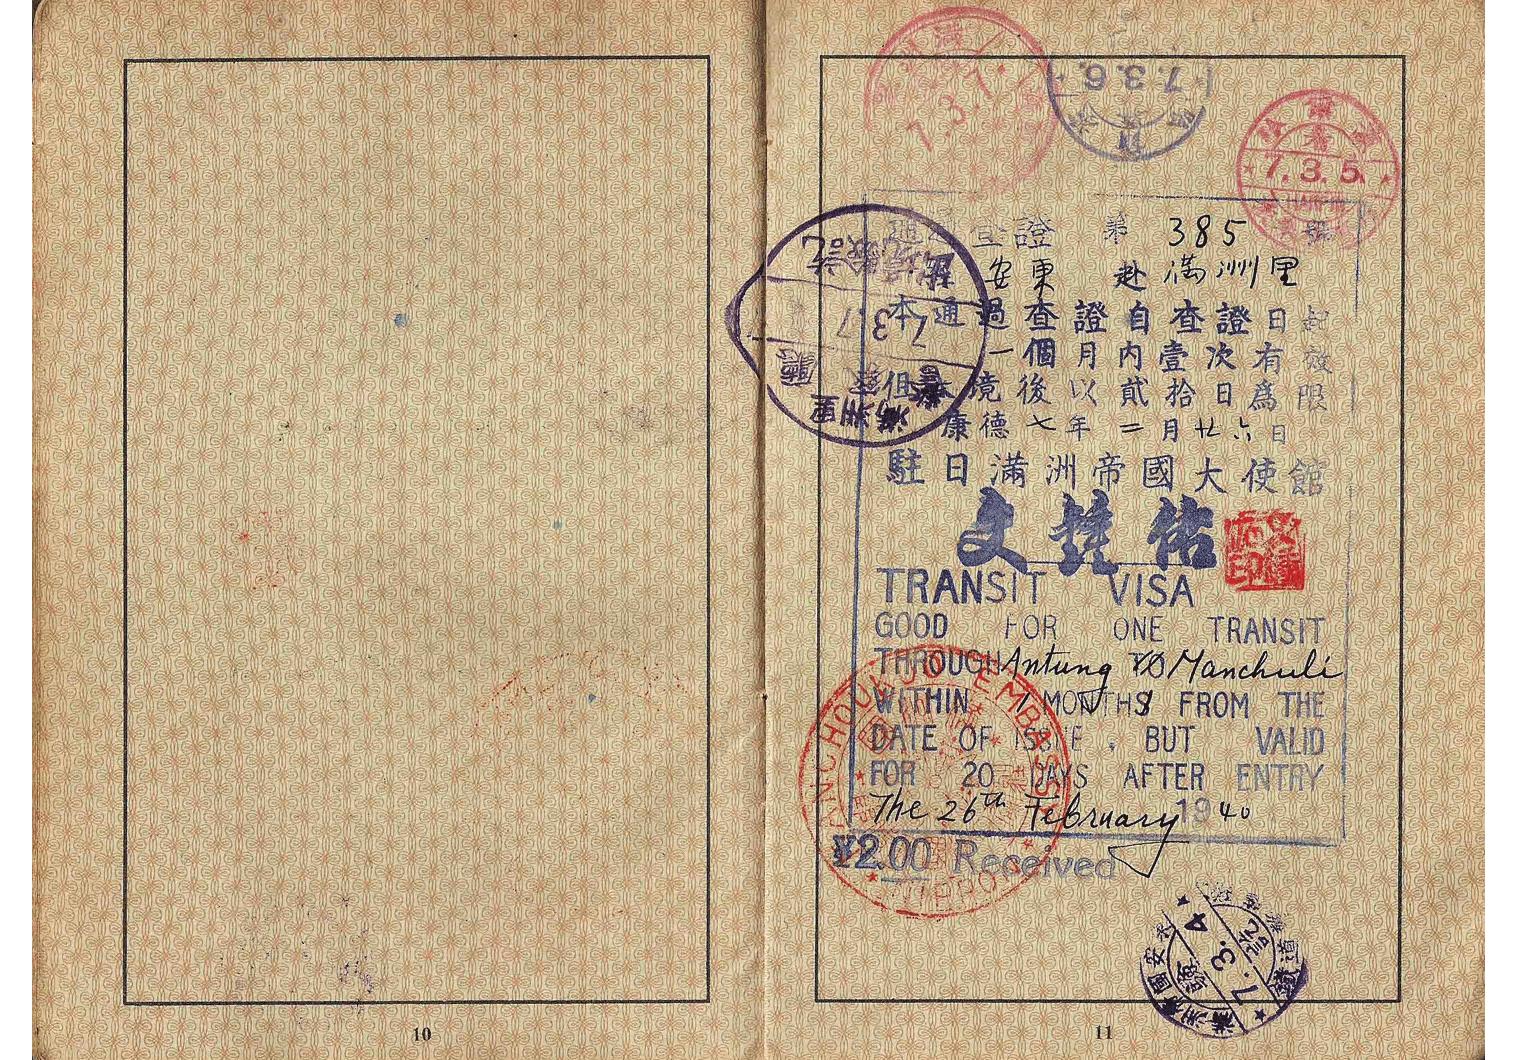 Manchurian visa WW2